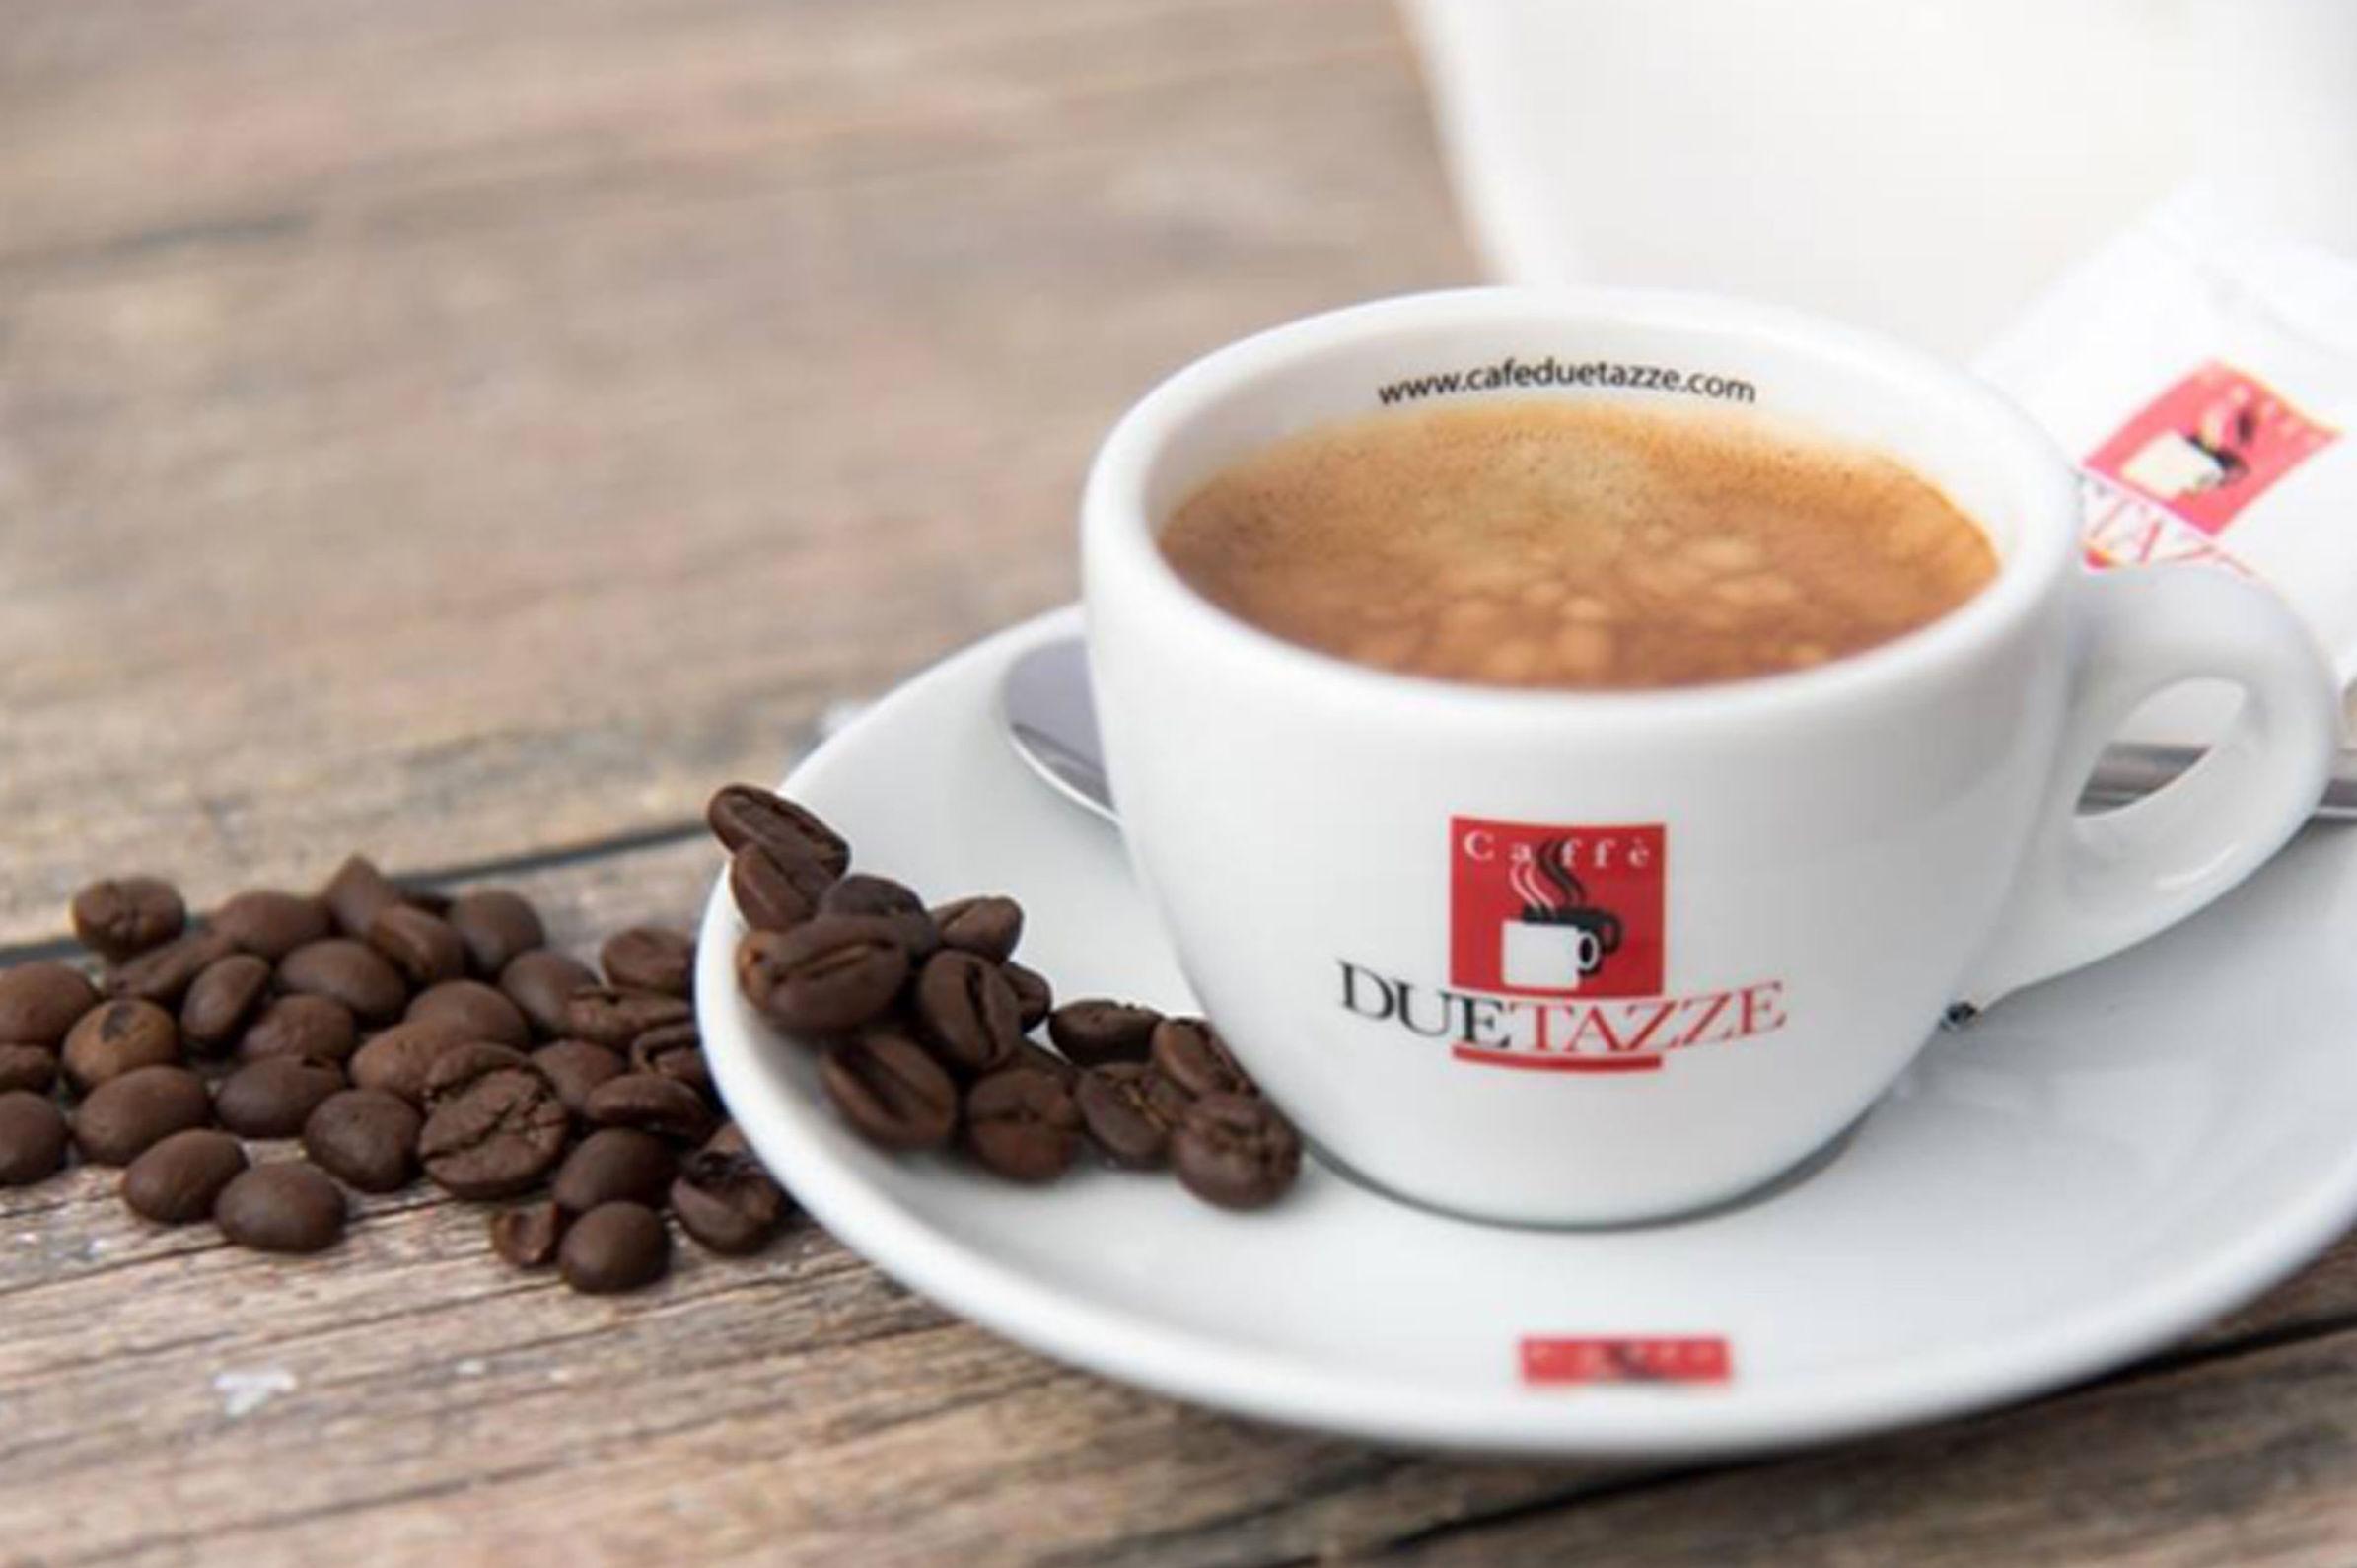 Foto 2 de Cafés en Fuentes de Andalucía | Caffè Duetazze